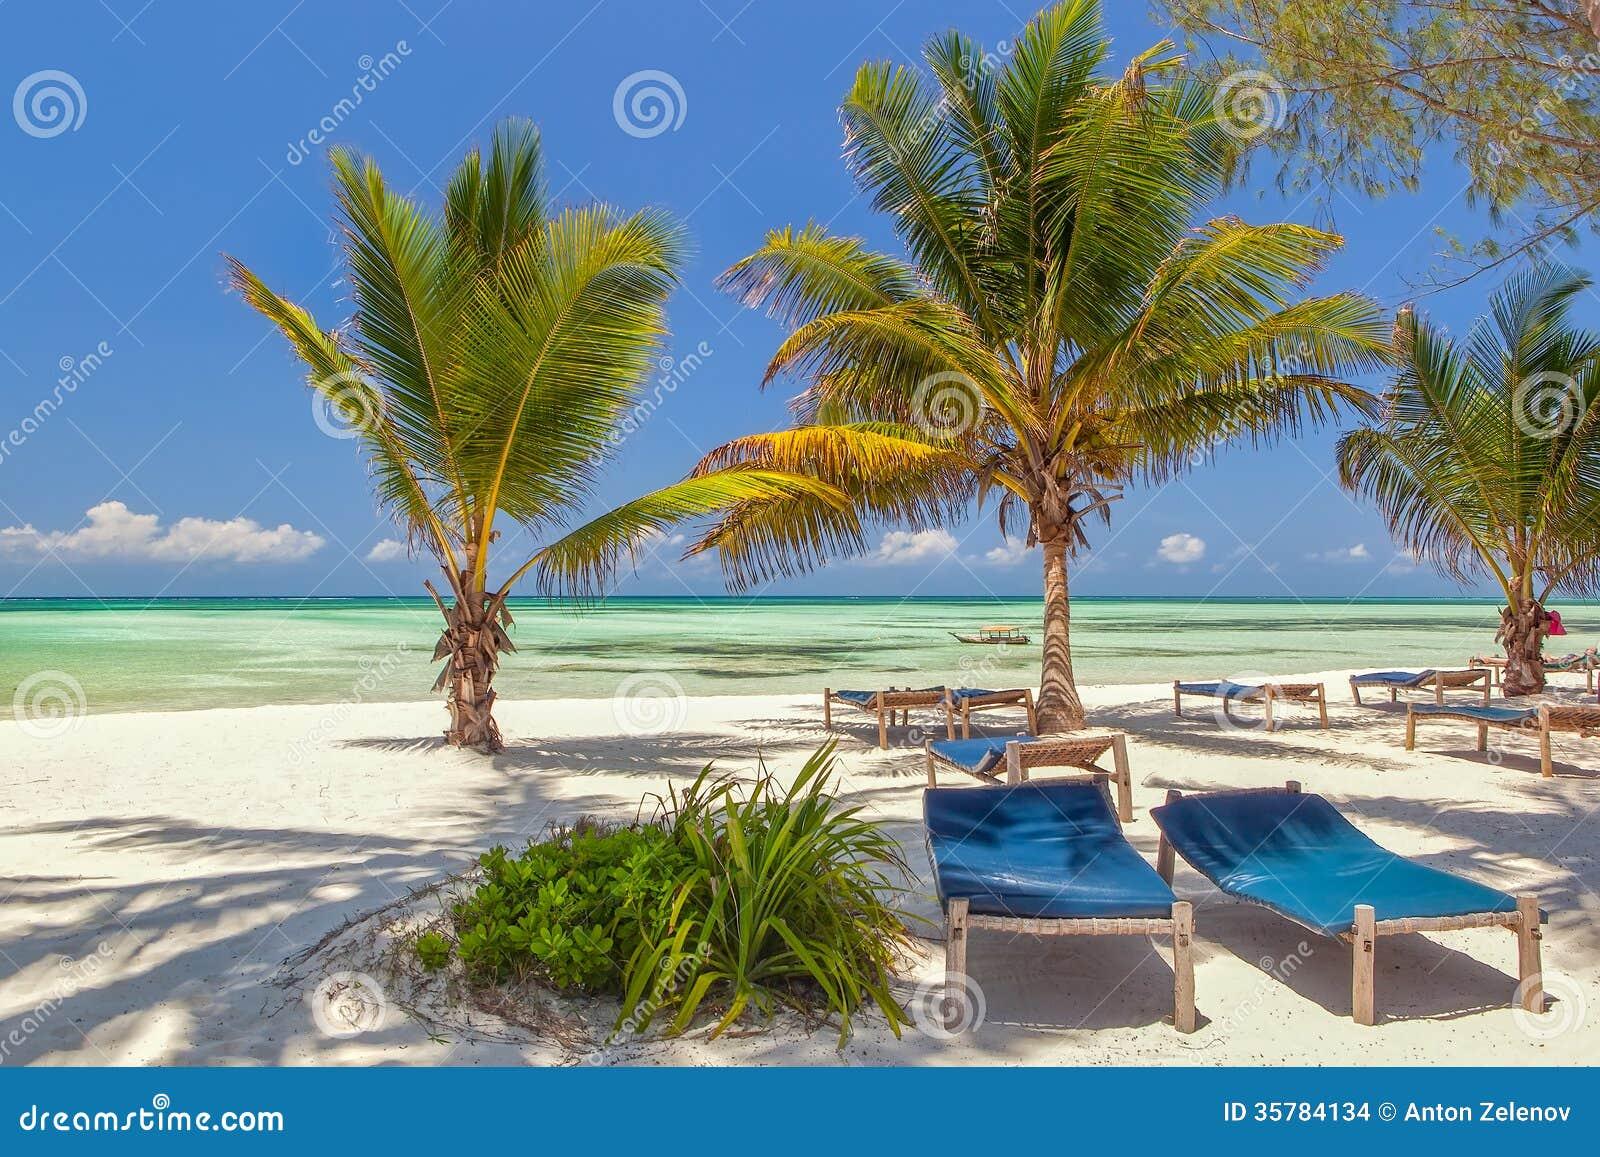 beach chairs indian lounge - Beach Lounge Chairs